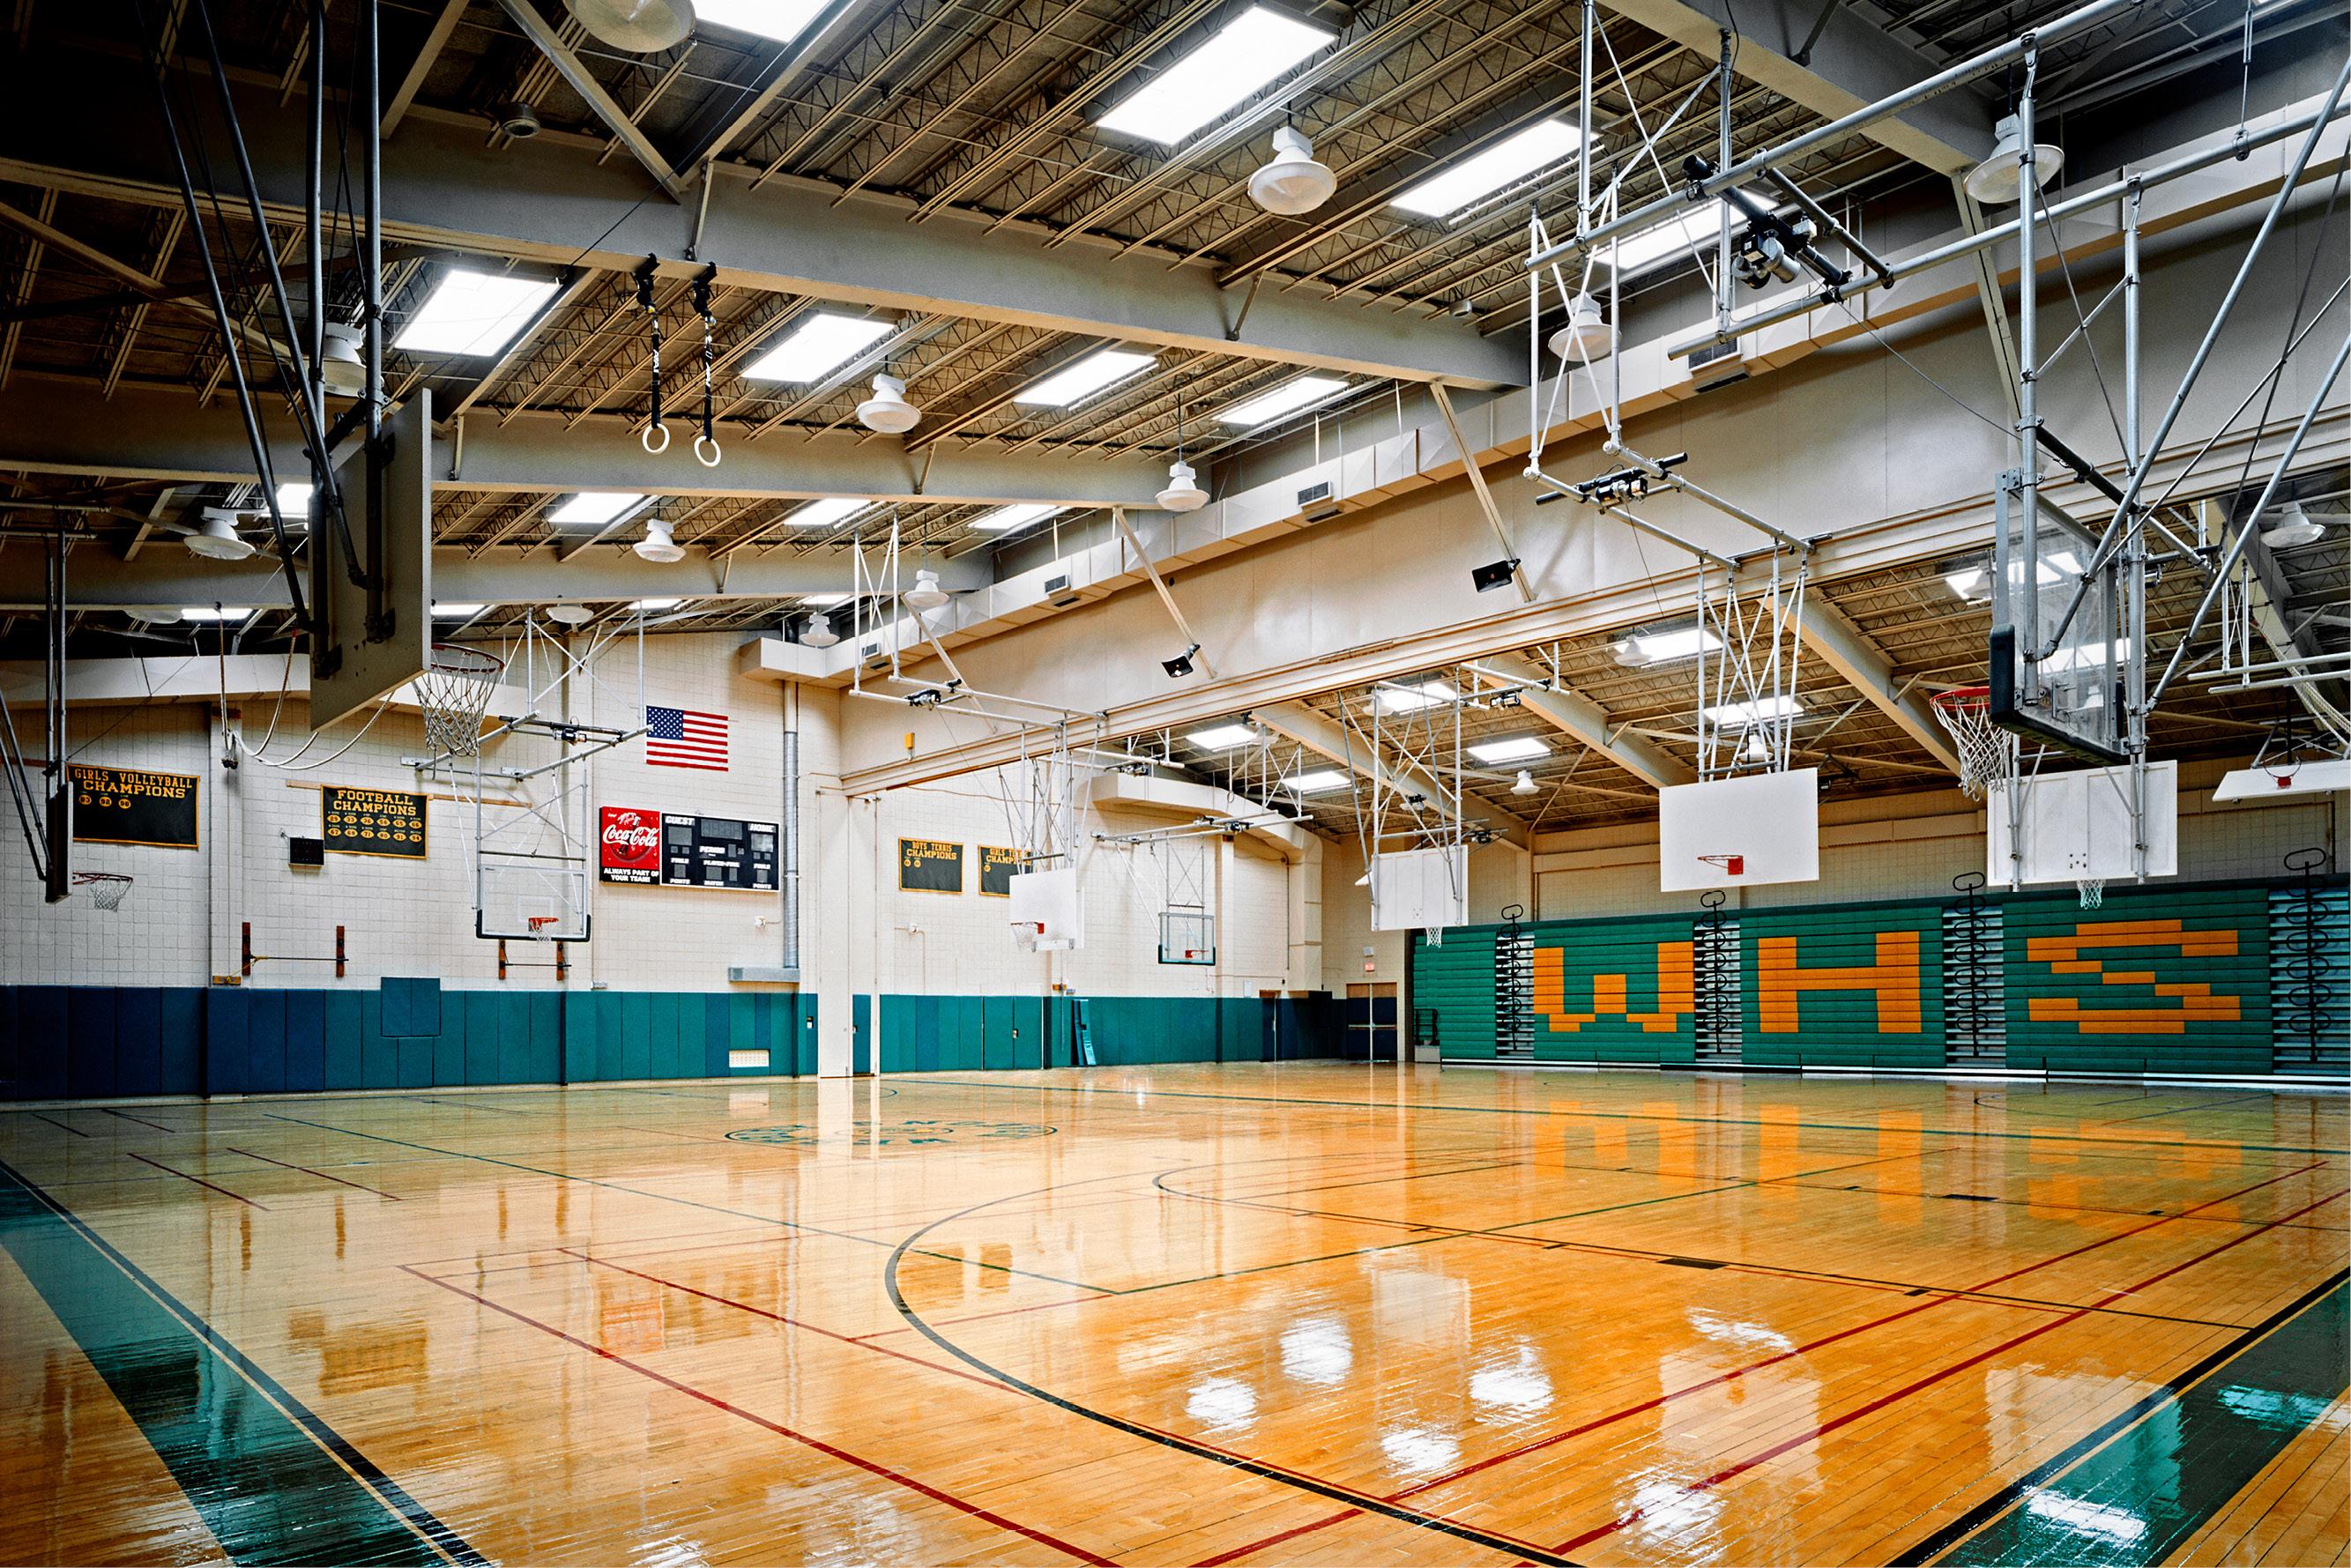 Westbury Union Free School District